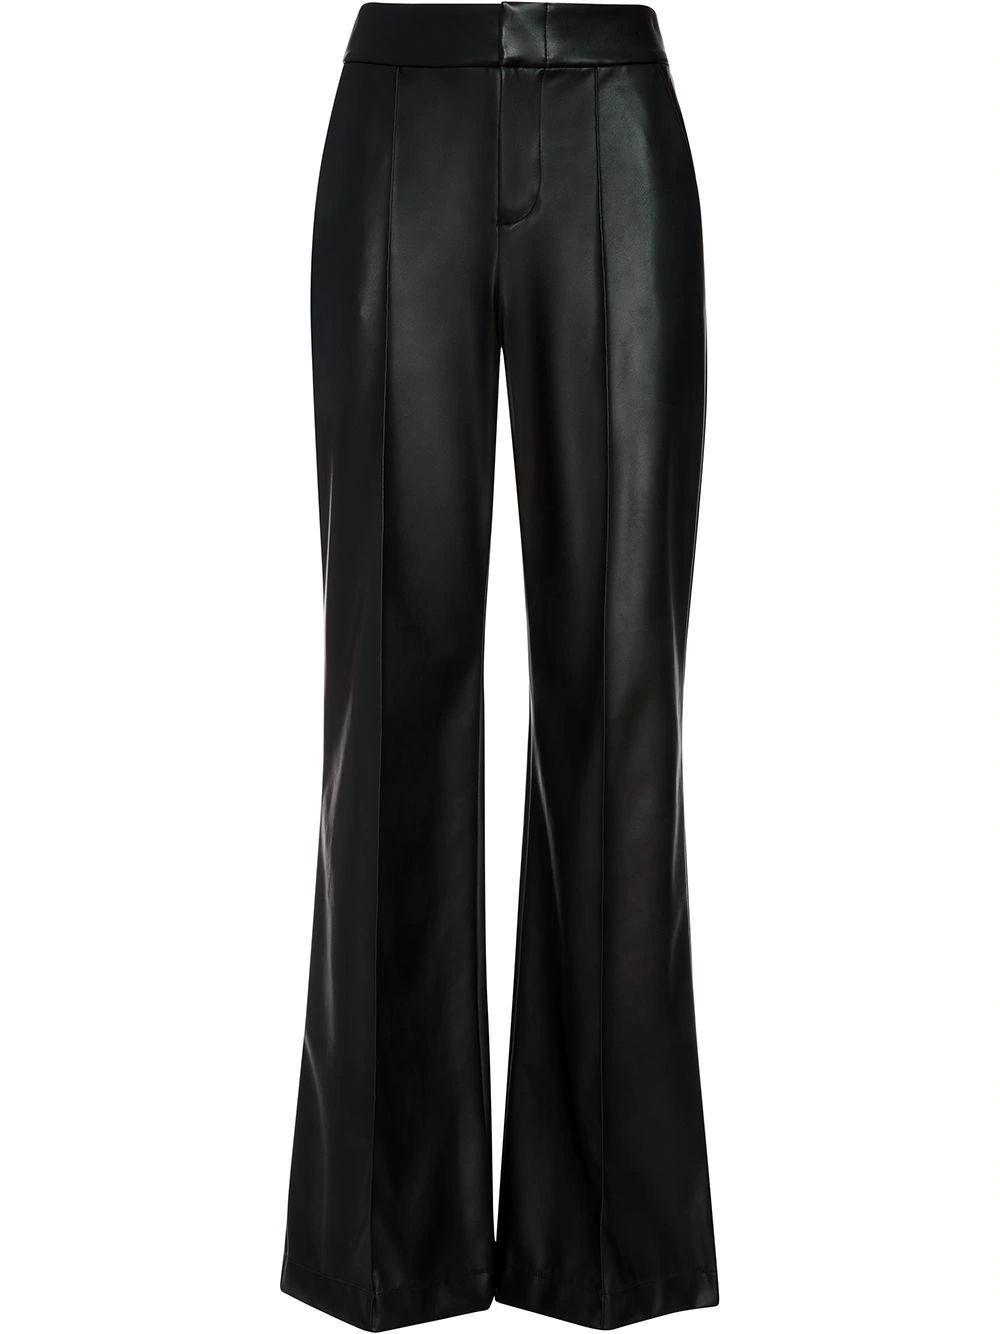 Dylan Vegan Leather Pant Item # CL000J22121